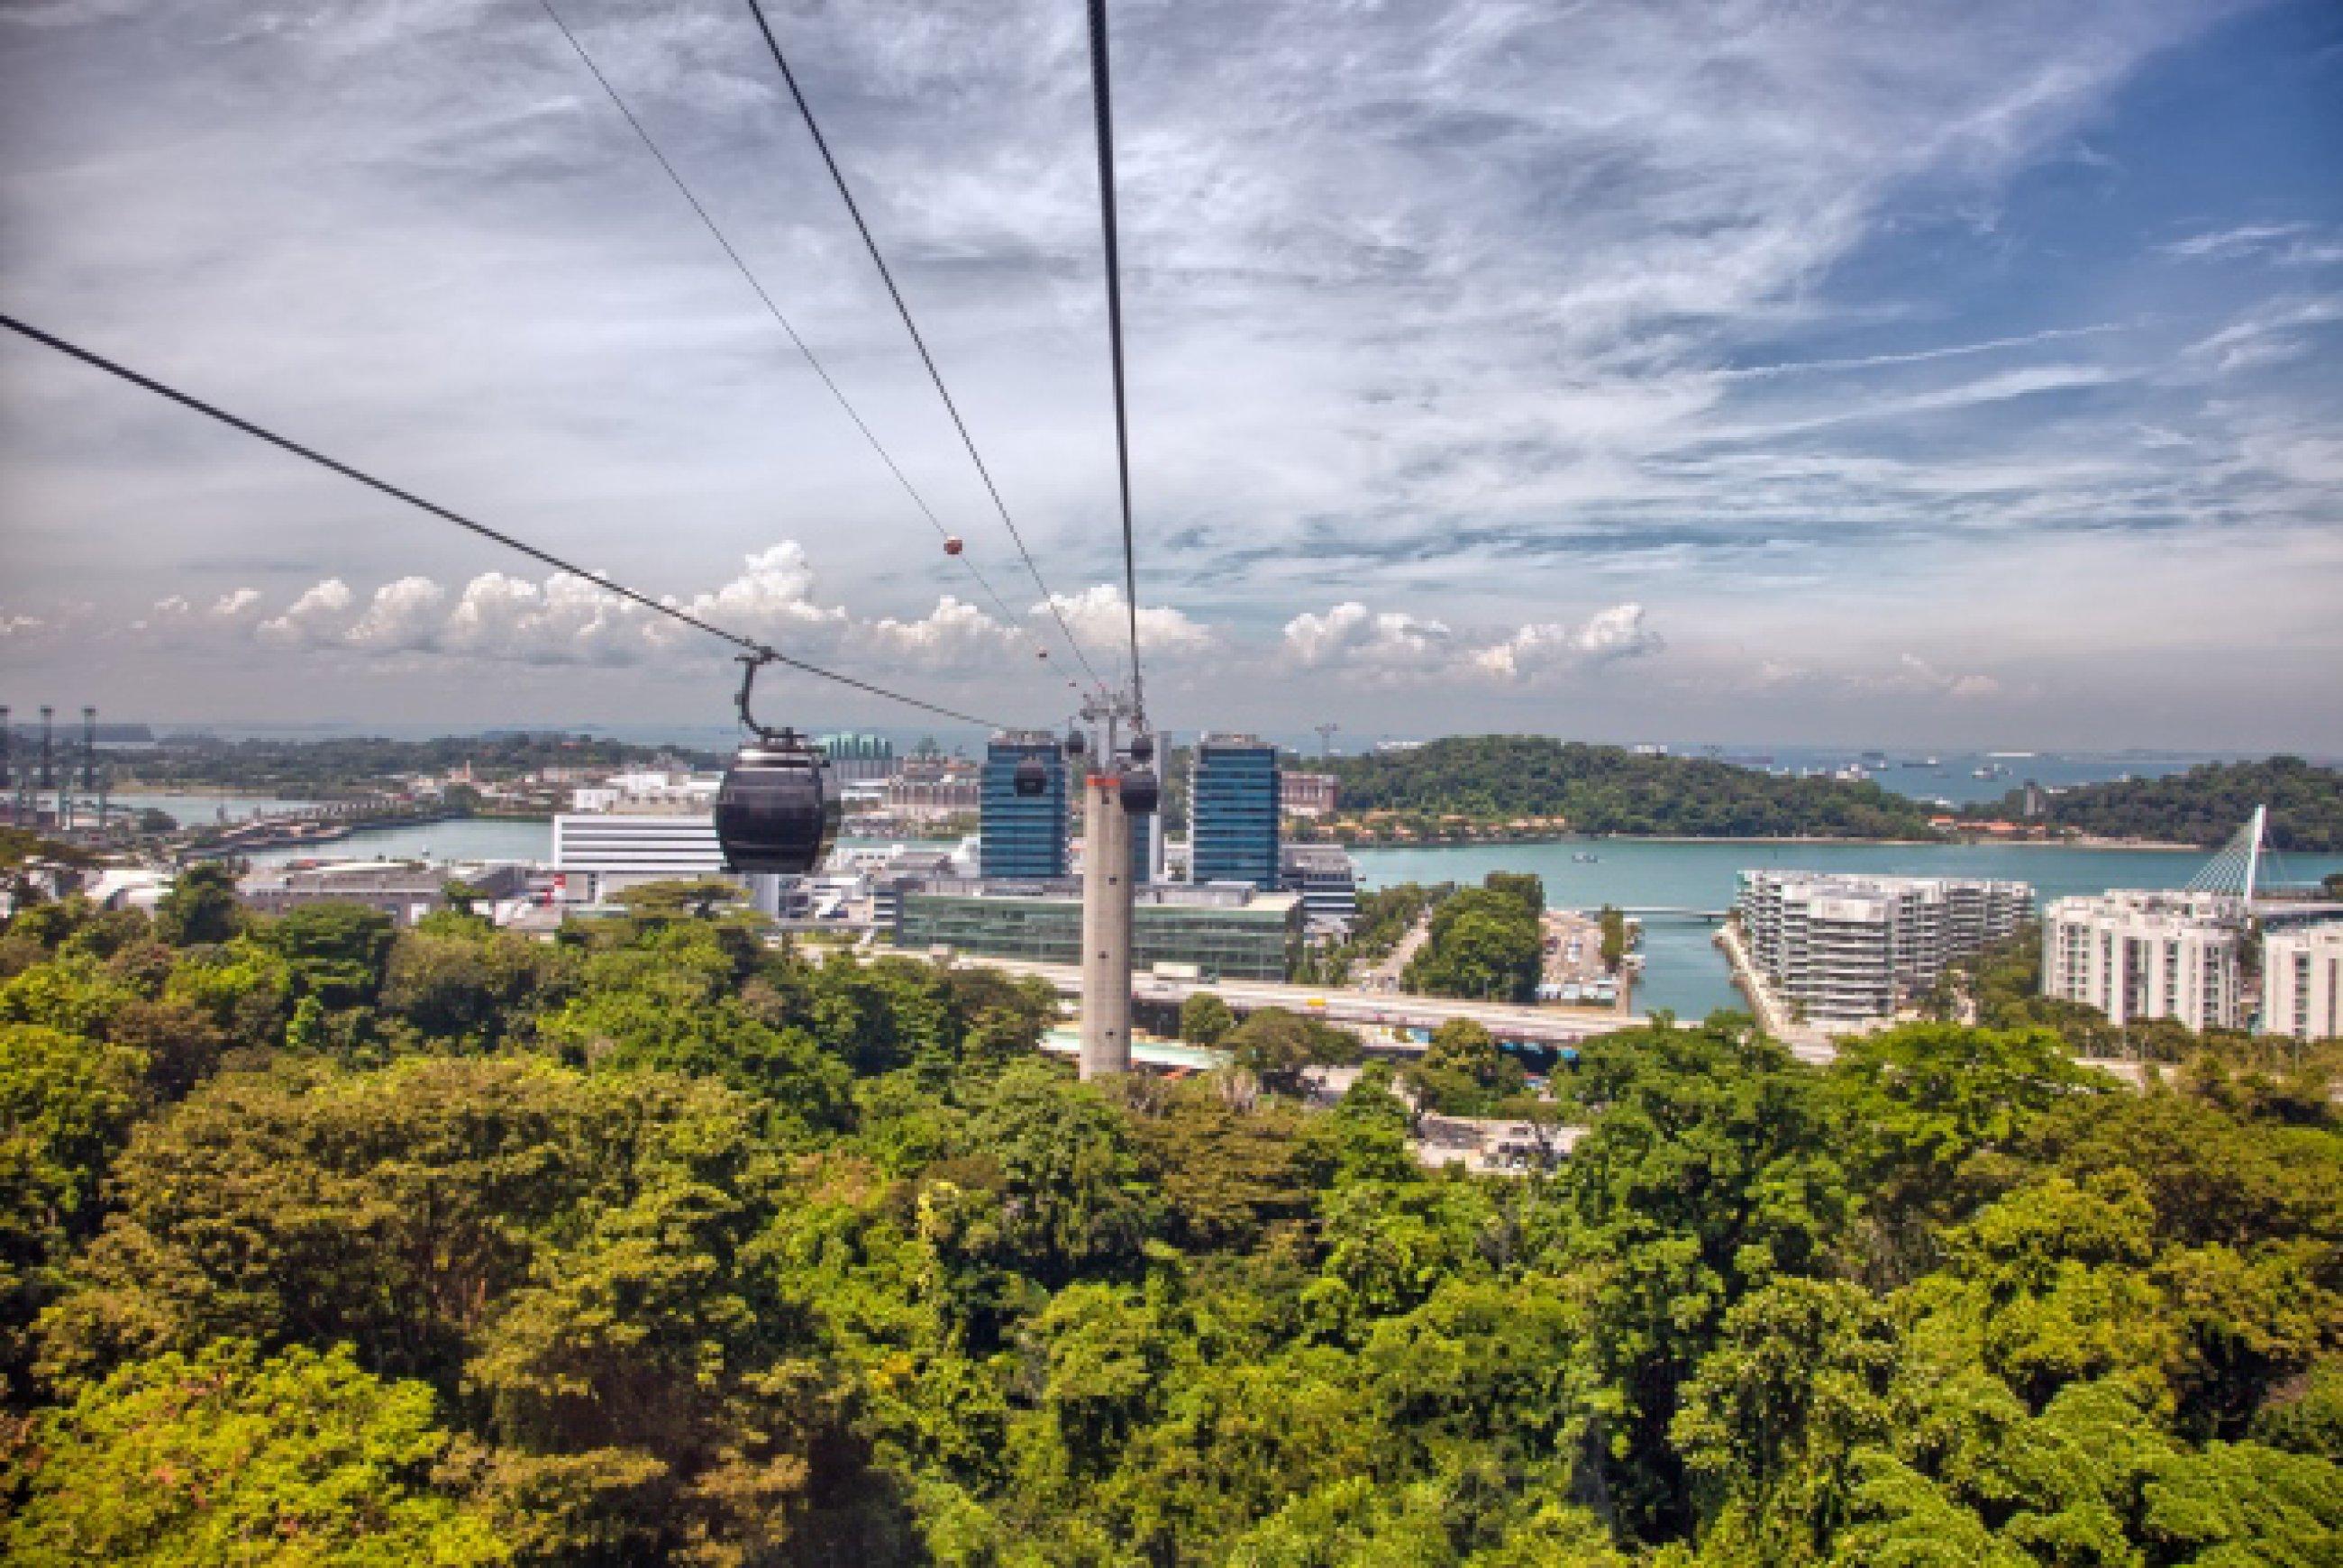 https://bubo.sk/uploads/galleries/8377/aerial-views-of-sentosa-island-singapore.jpg